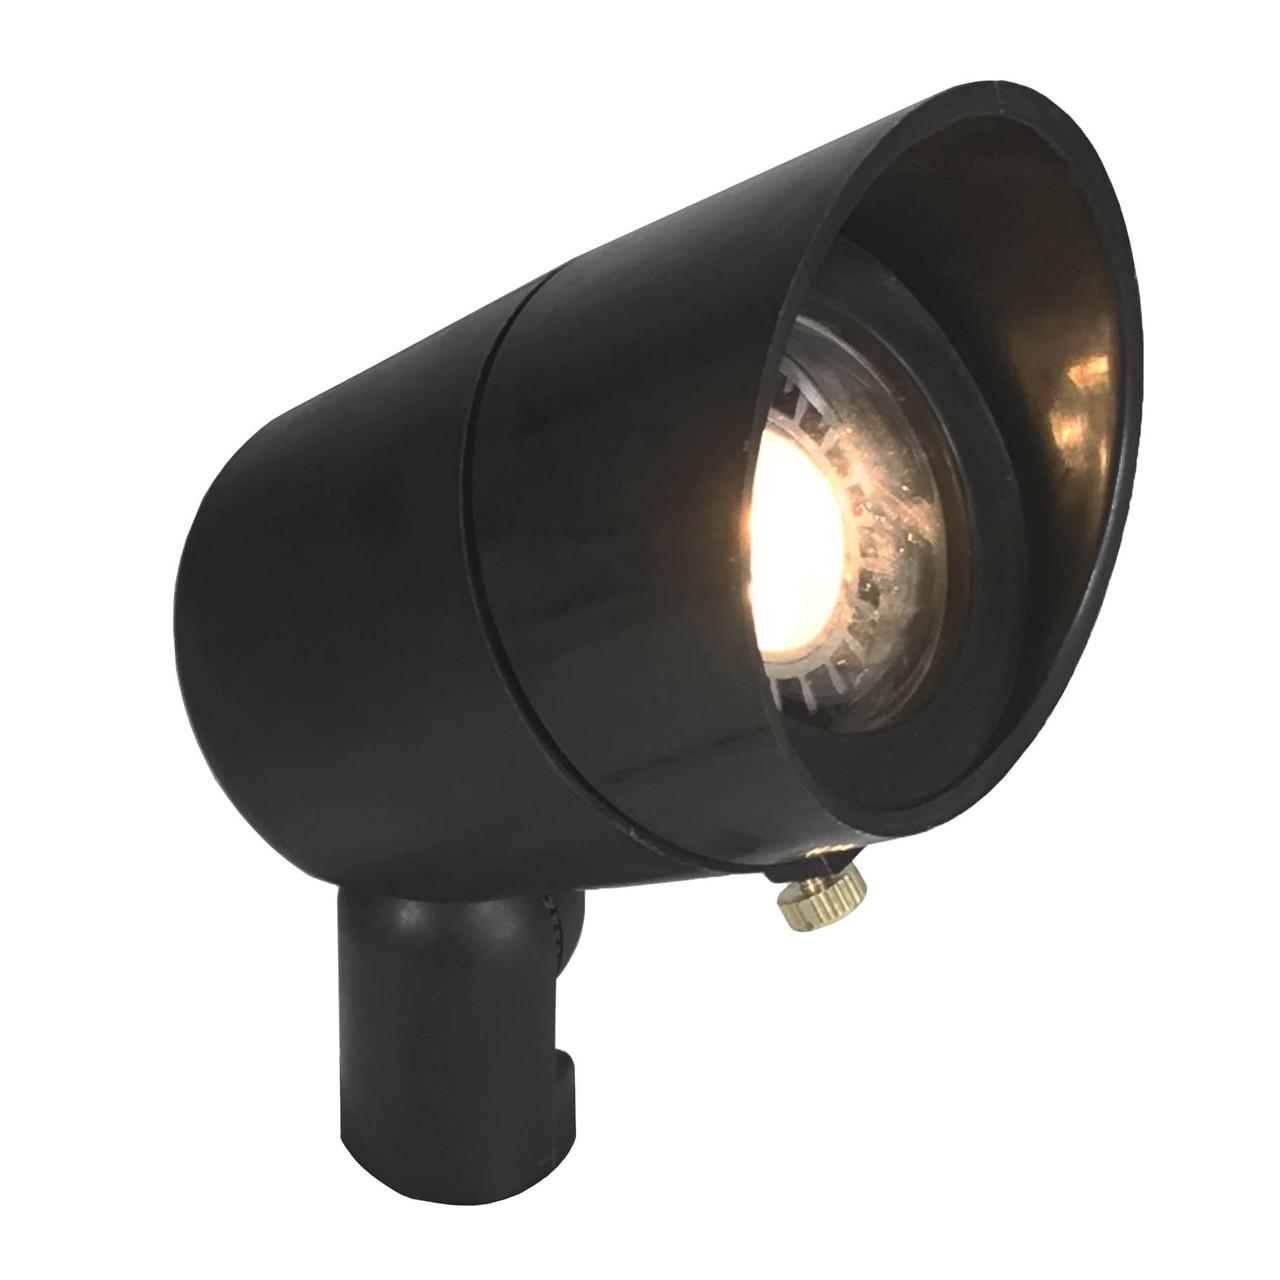 Landscape Lighting Spotlight: 12V LED Raw Composite Directional Landscape Spotlight